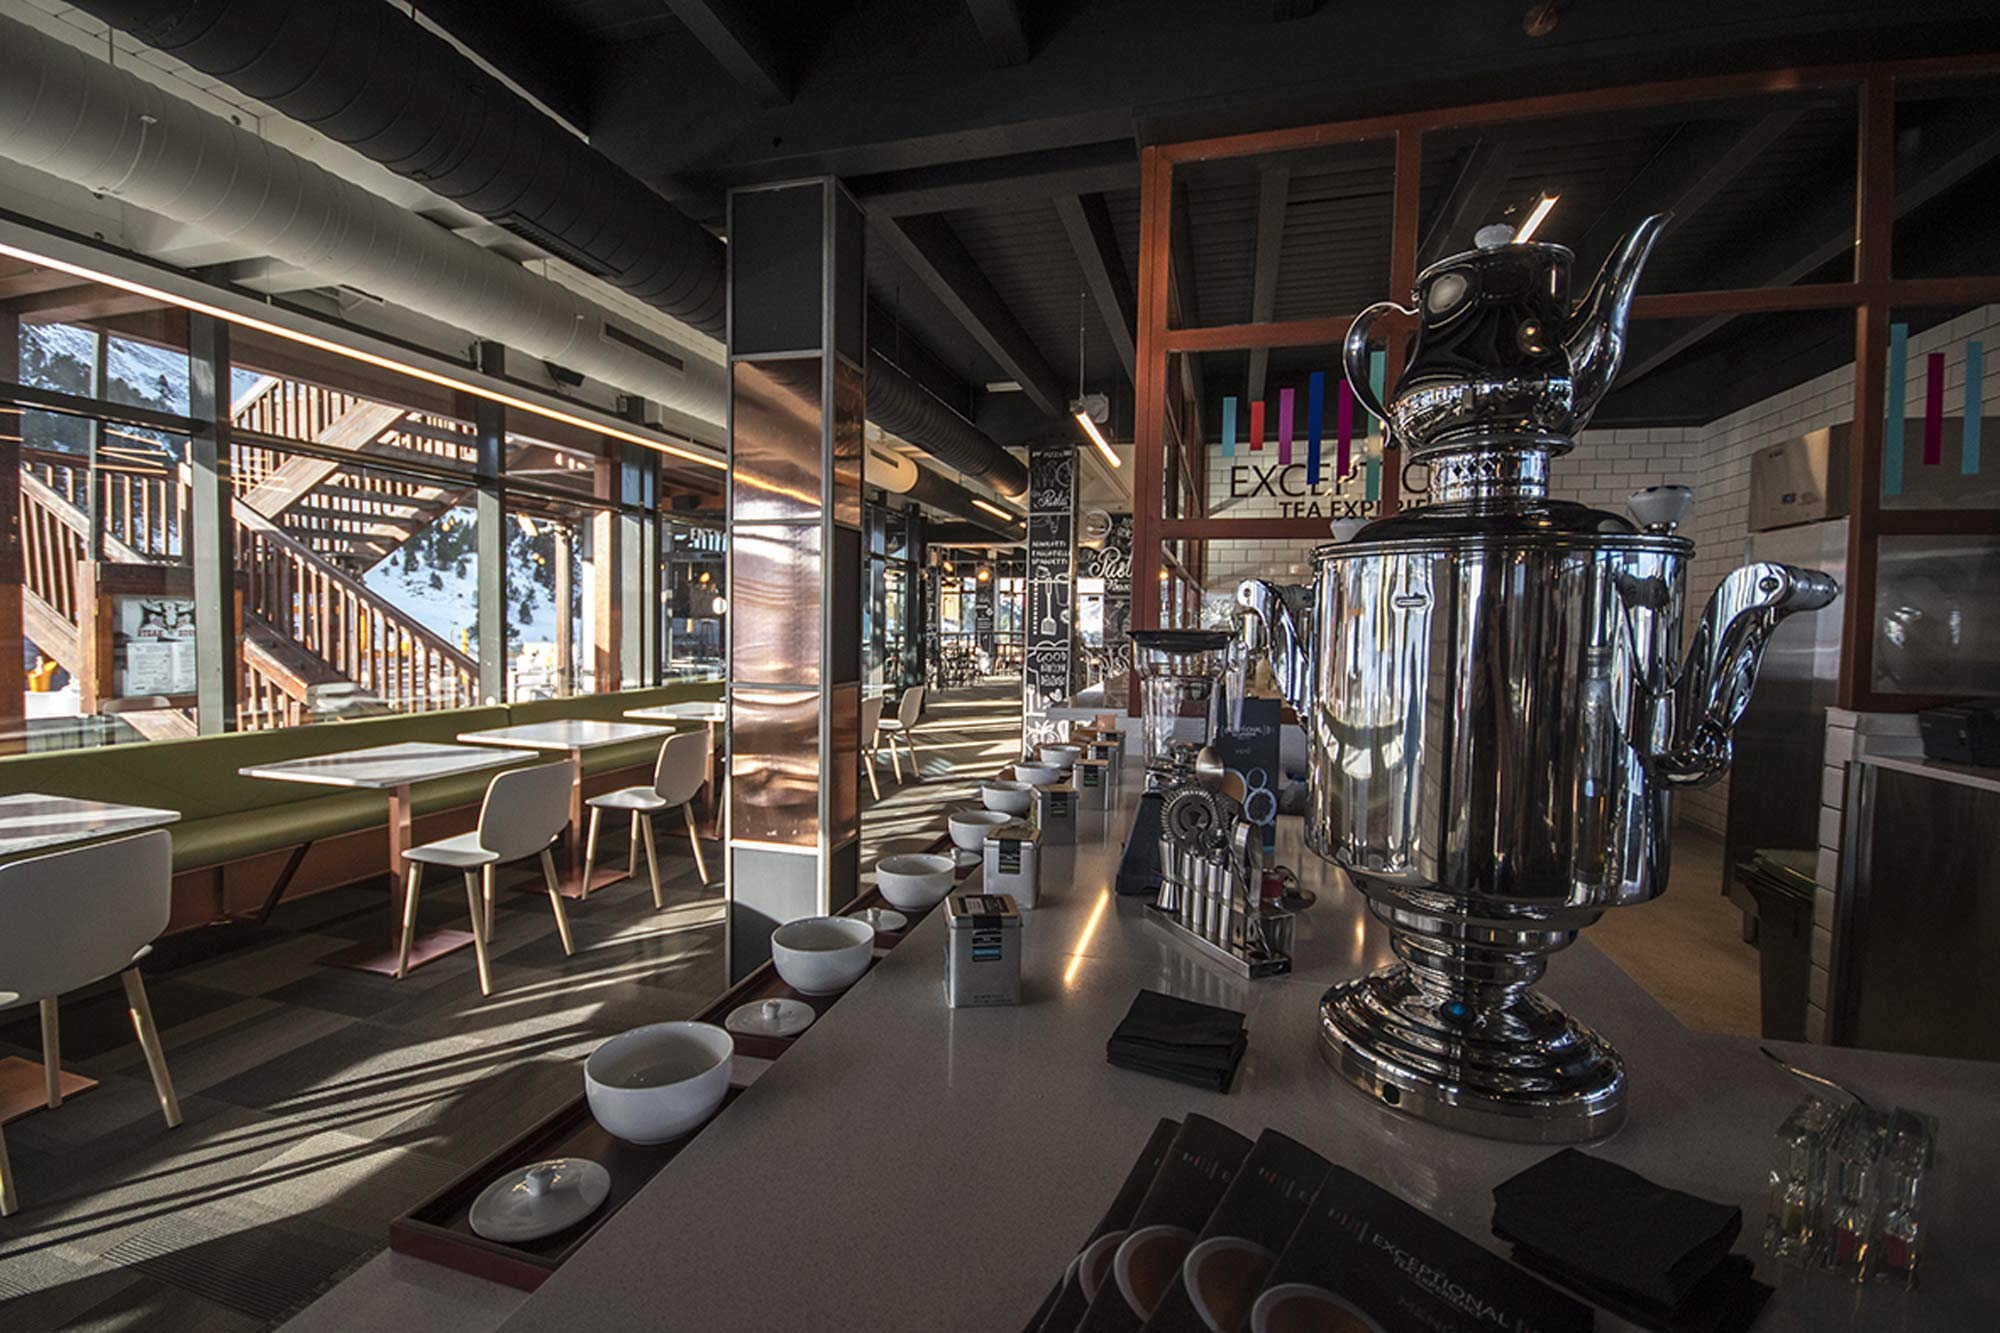 Mobiliario a medida Exceptional Tea Lounge Experience by Dilmah Grandvalira, Andorra - Rosa Colet